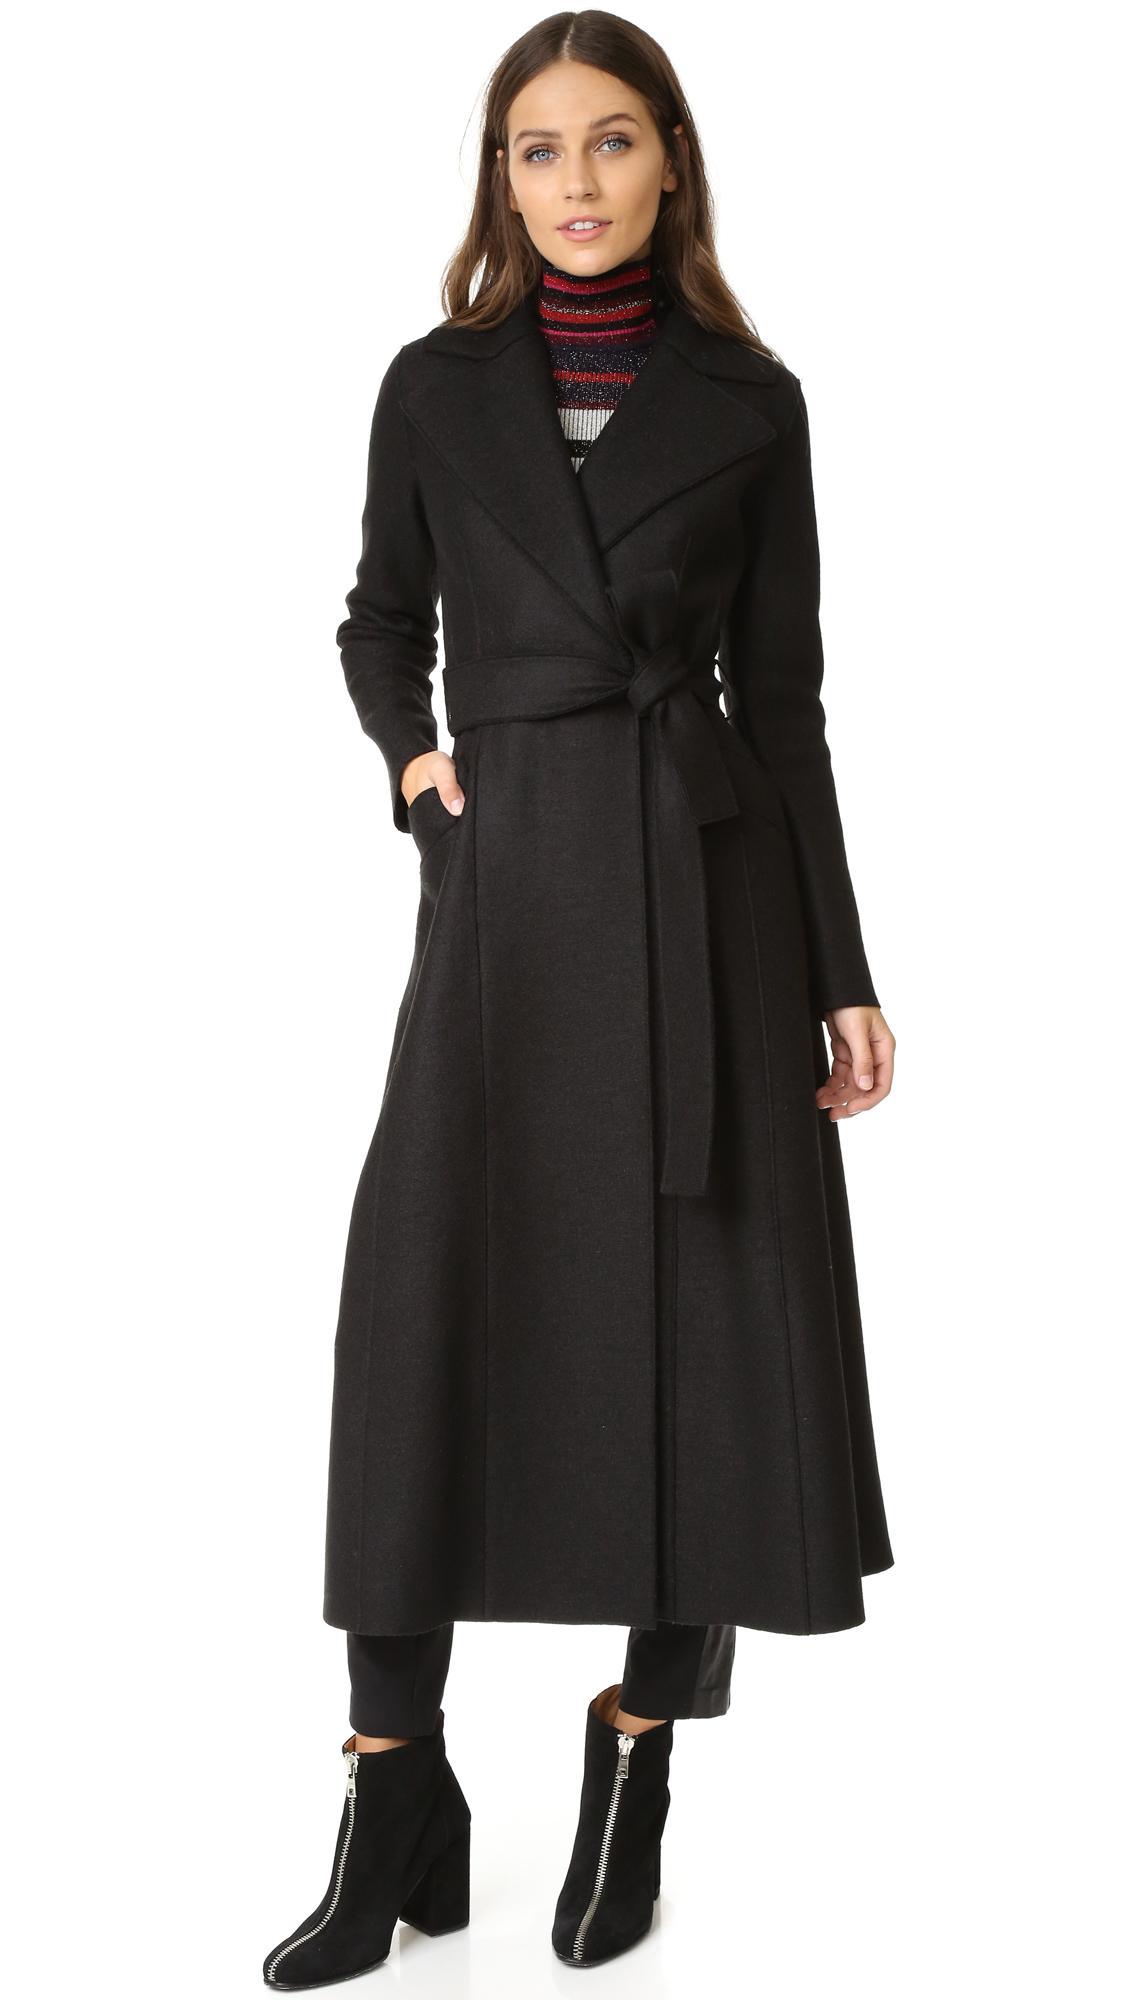 lyst harris wharf london long duster coat in brown. Black Bedroom Furniture Sets. Home Design Ideas